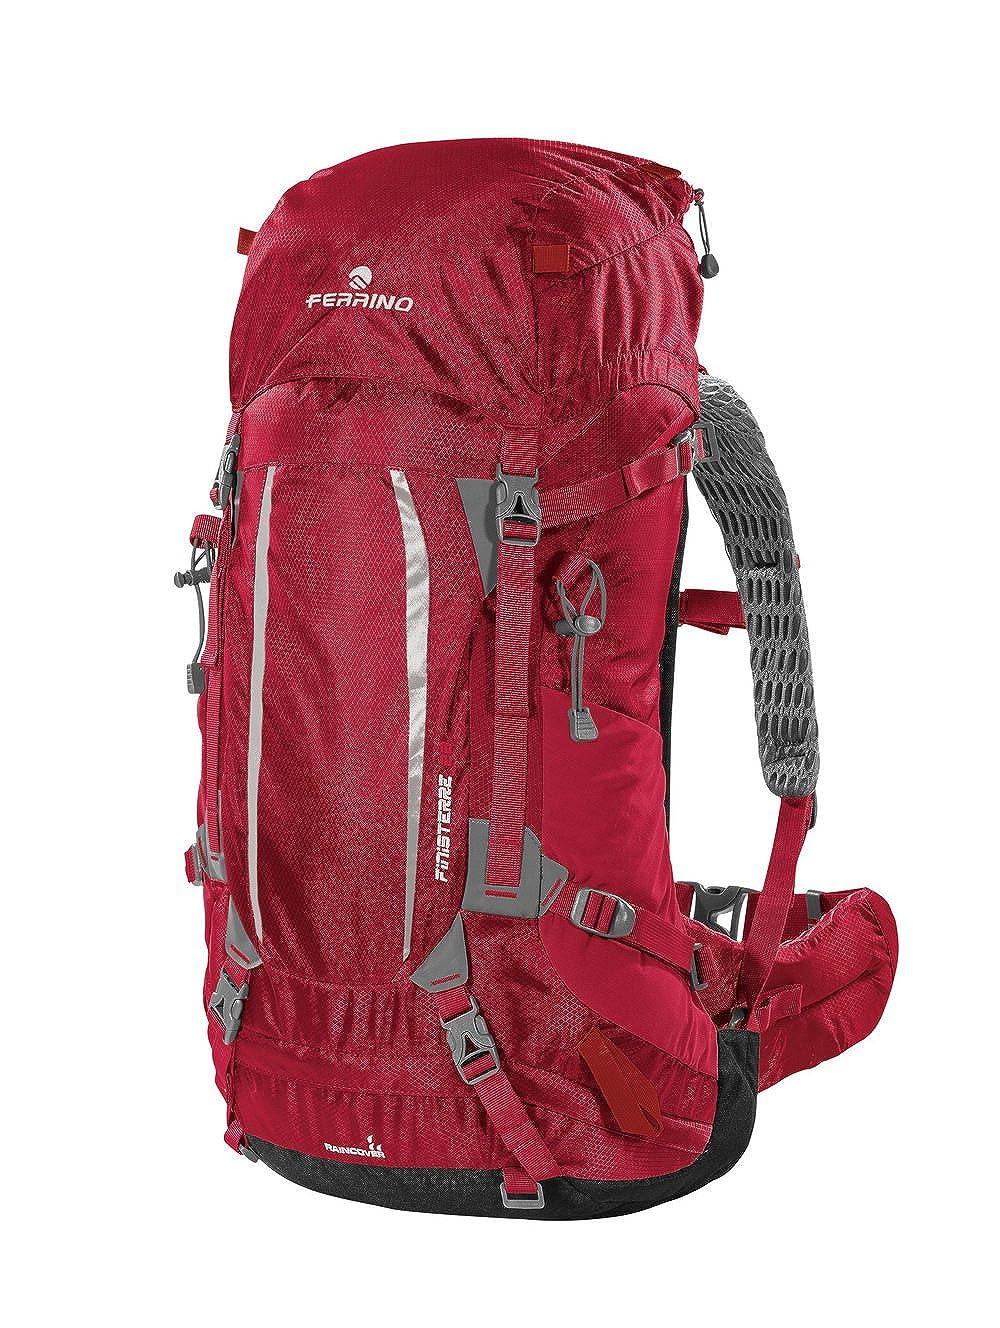 Ferrino Finisterre 30女性用バックパック、レッド、L   B01LZYMDLR